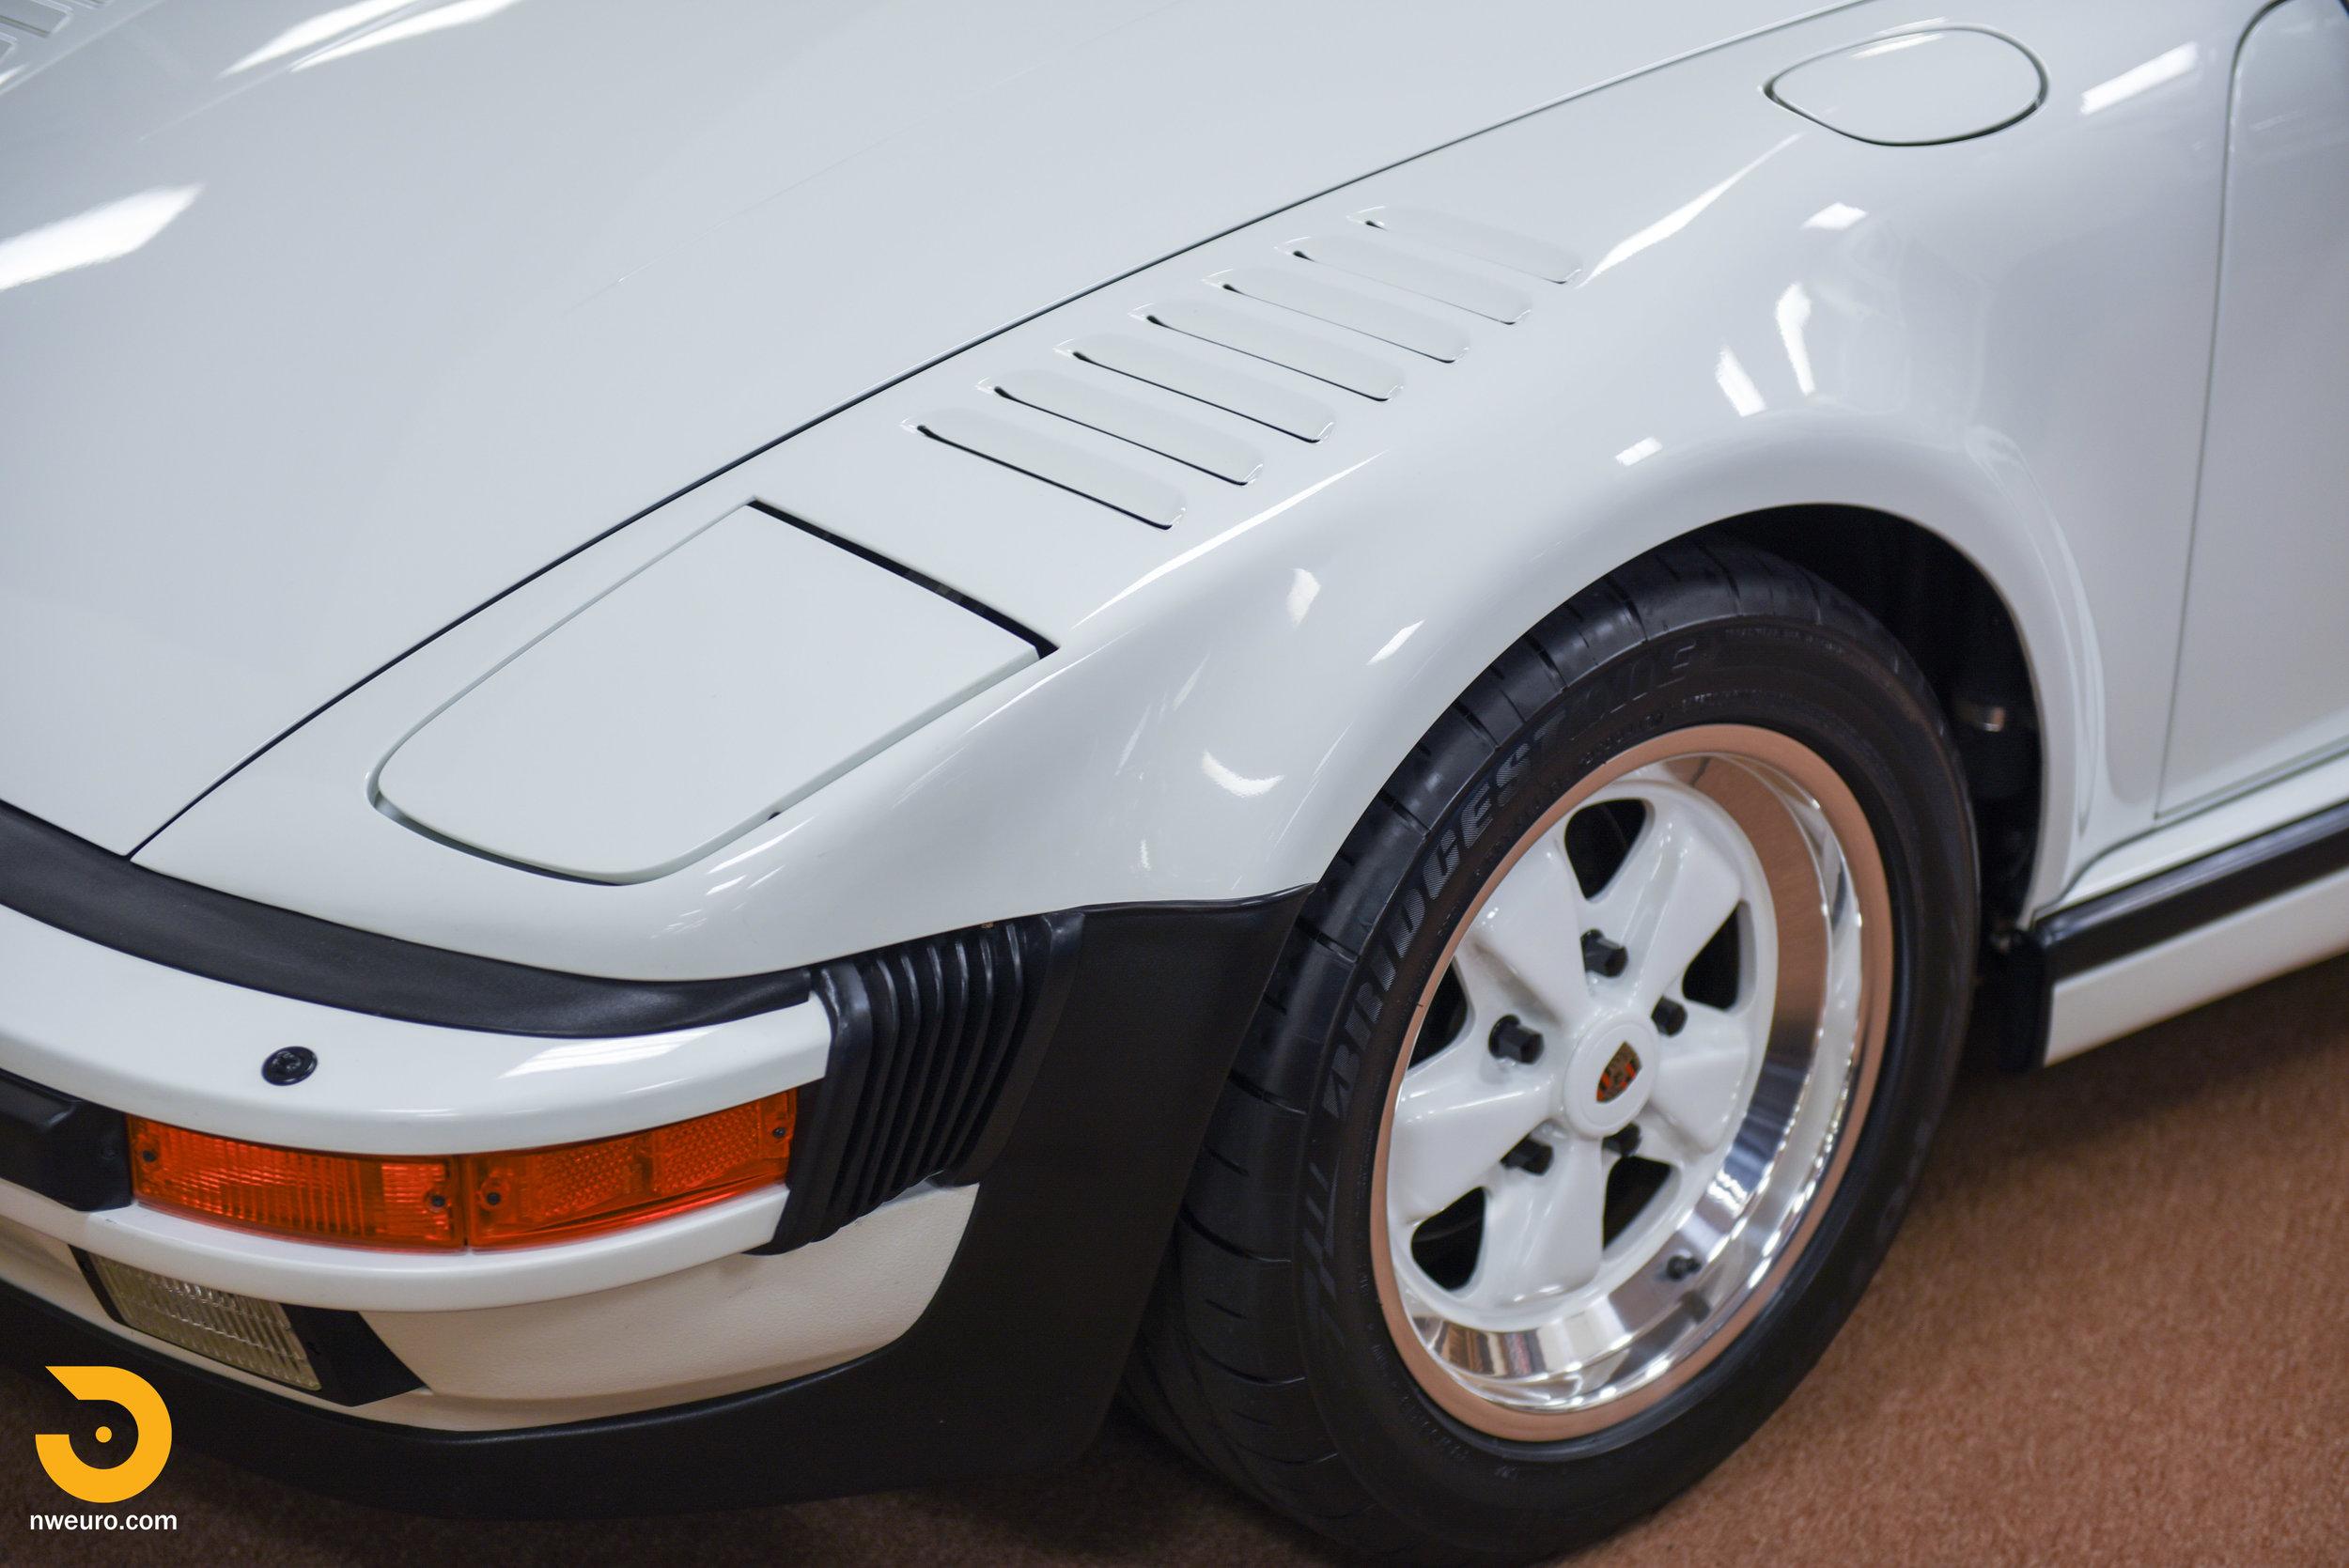 1987 Porsche 930 Slant Nose Cab Details-21.jpg